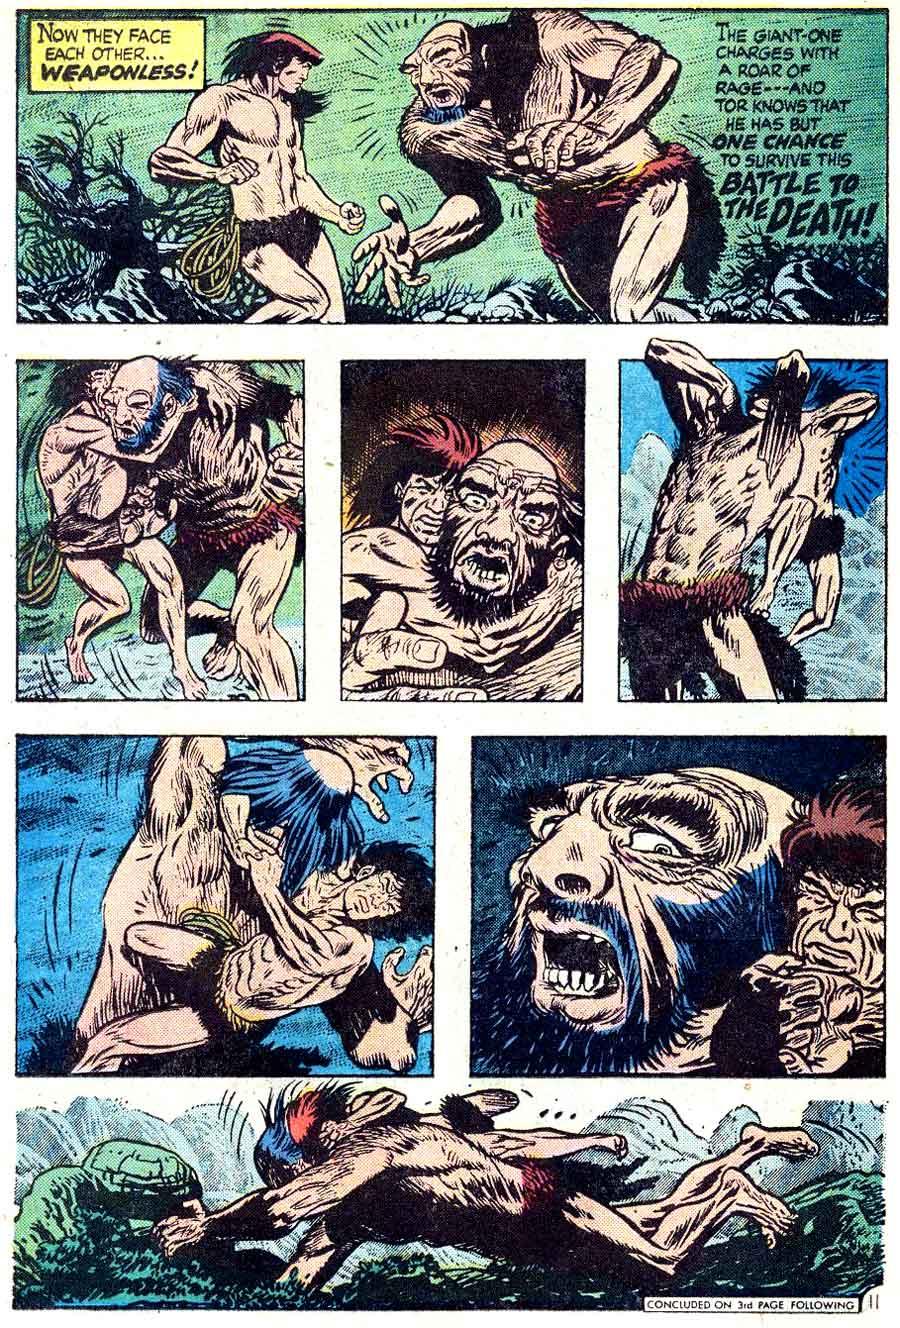 Tor v2 #5 dc bronze age comic book page art by Joe Kubert